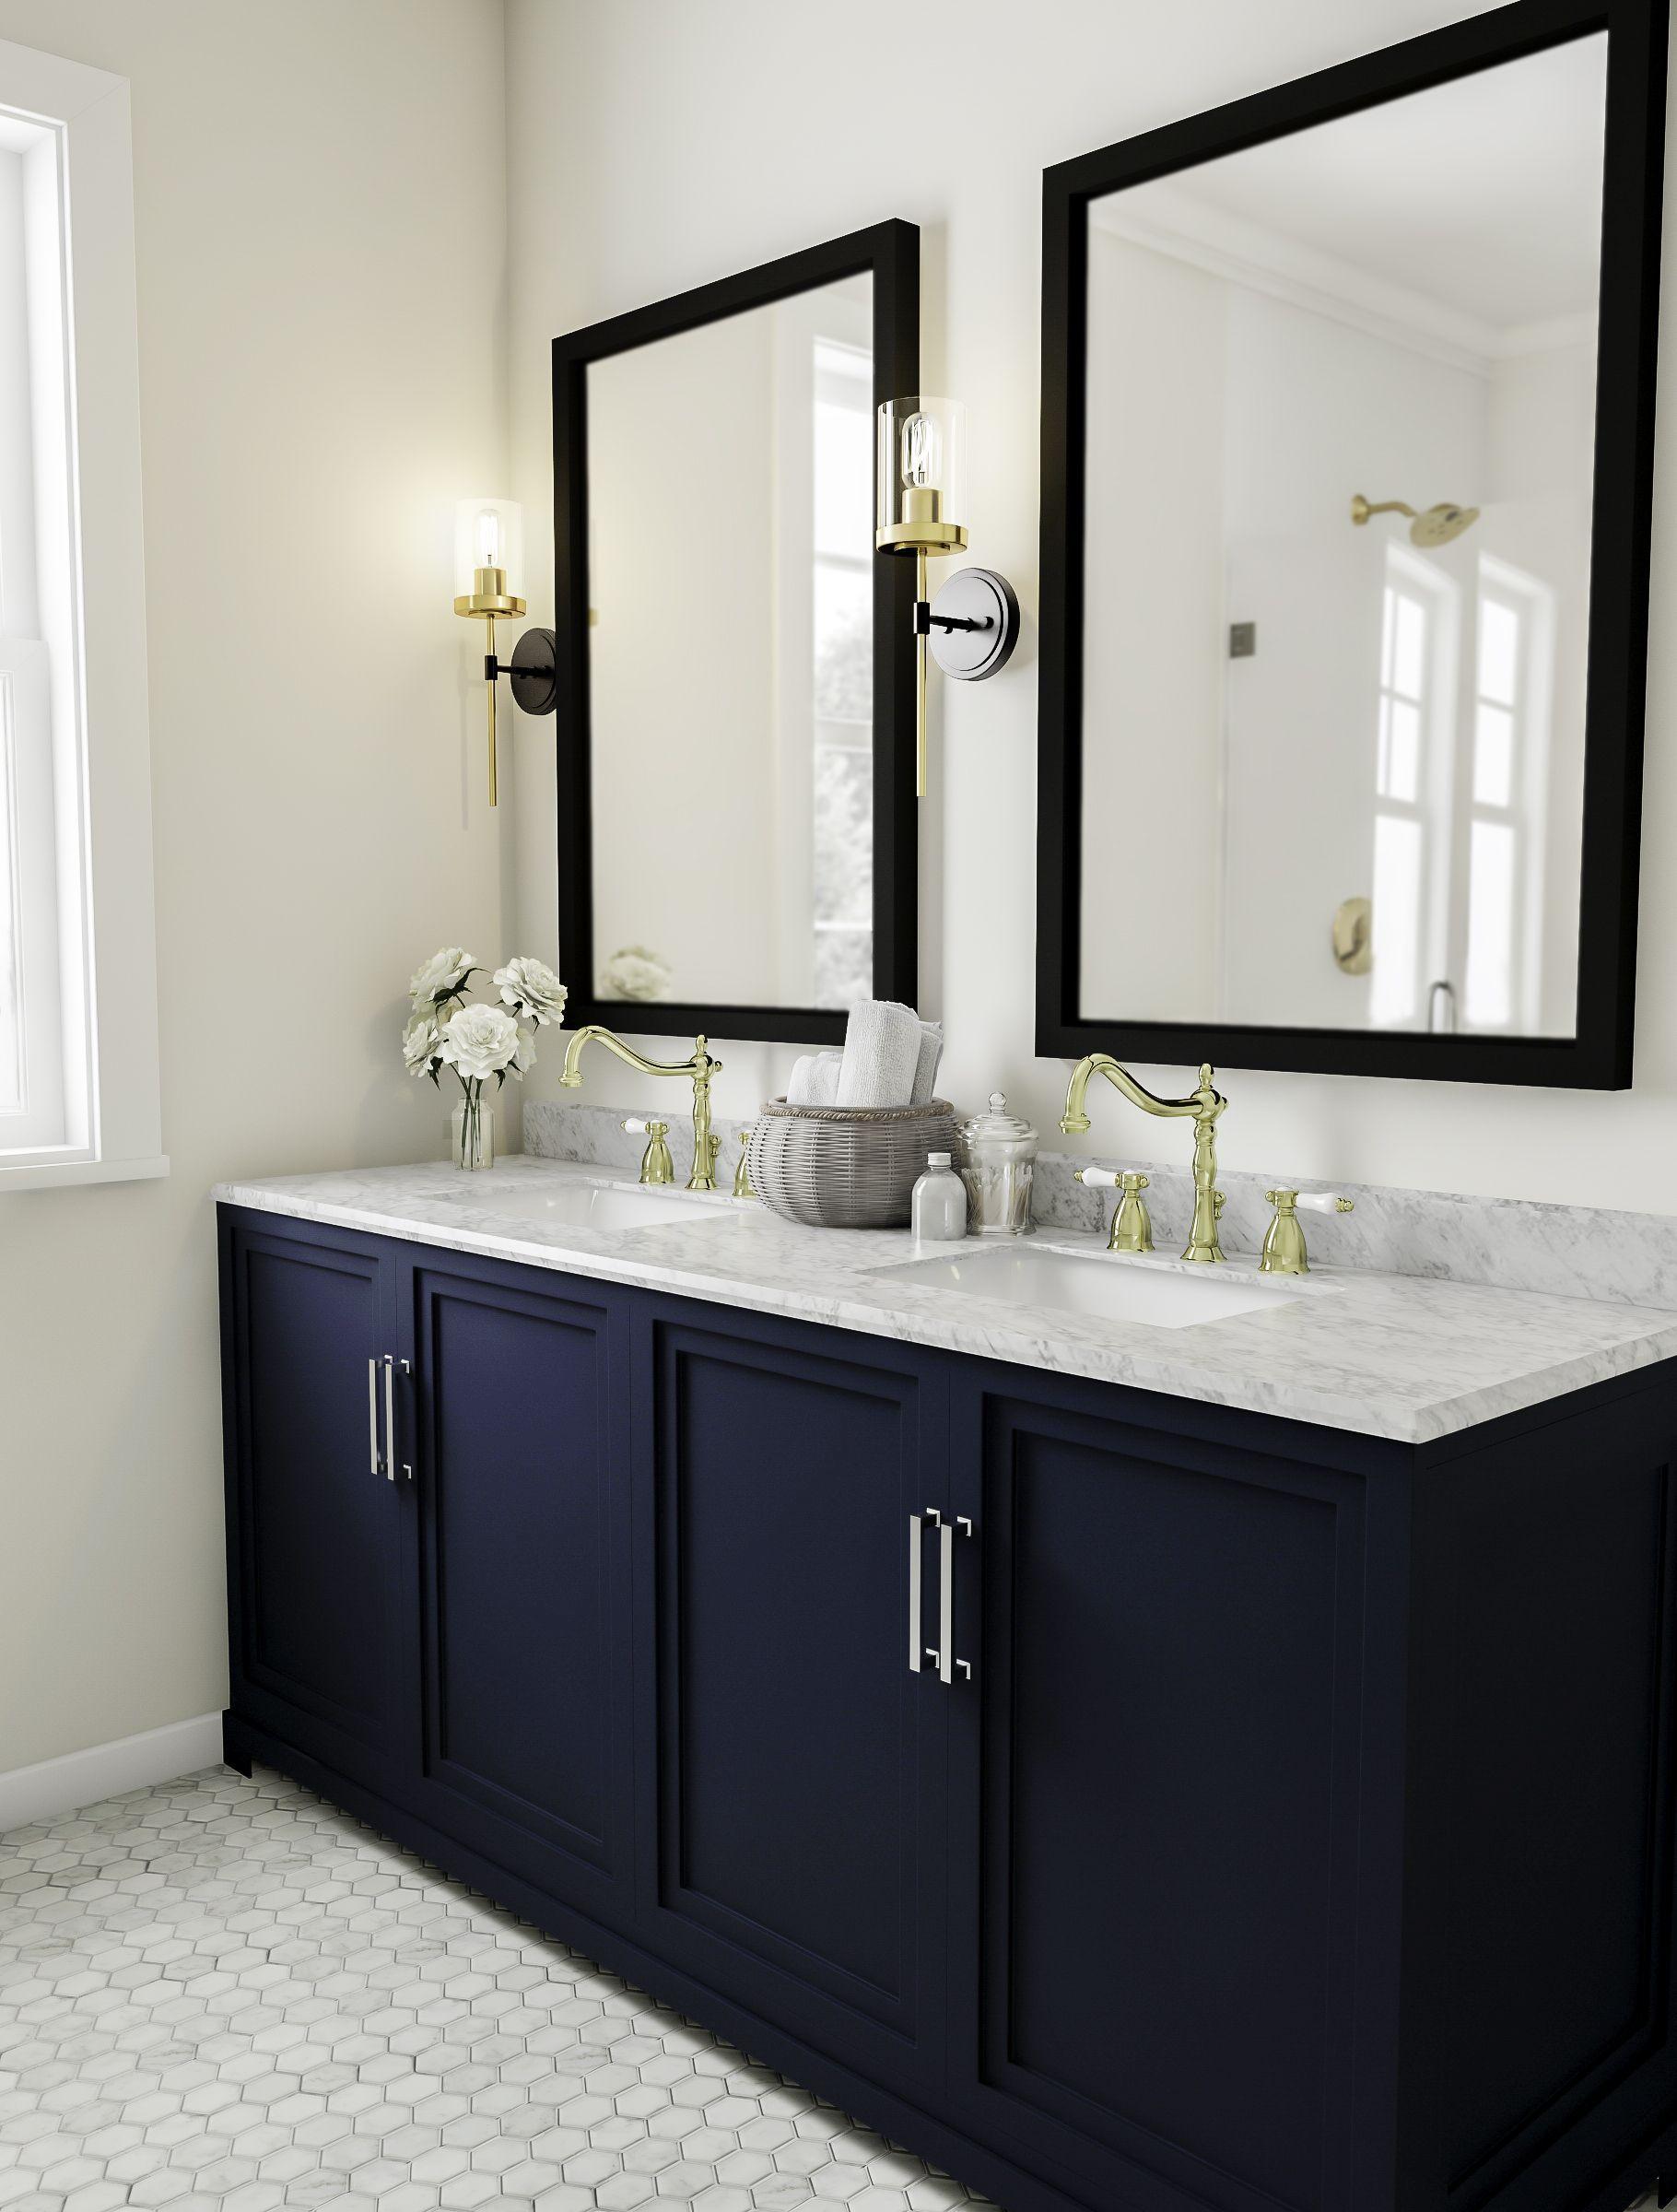 Impress Your Visitors With These 14 Cute Half Bathroom Designs Bathroom Vanity Decor Bamboo Bathroom Bathroom Design Decor